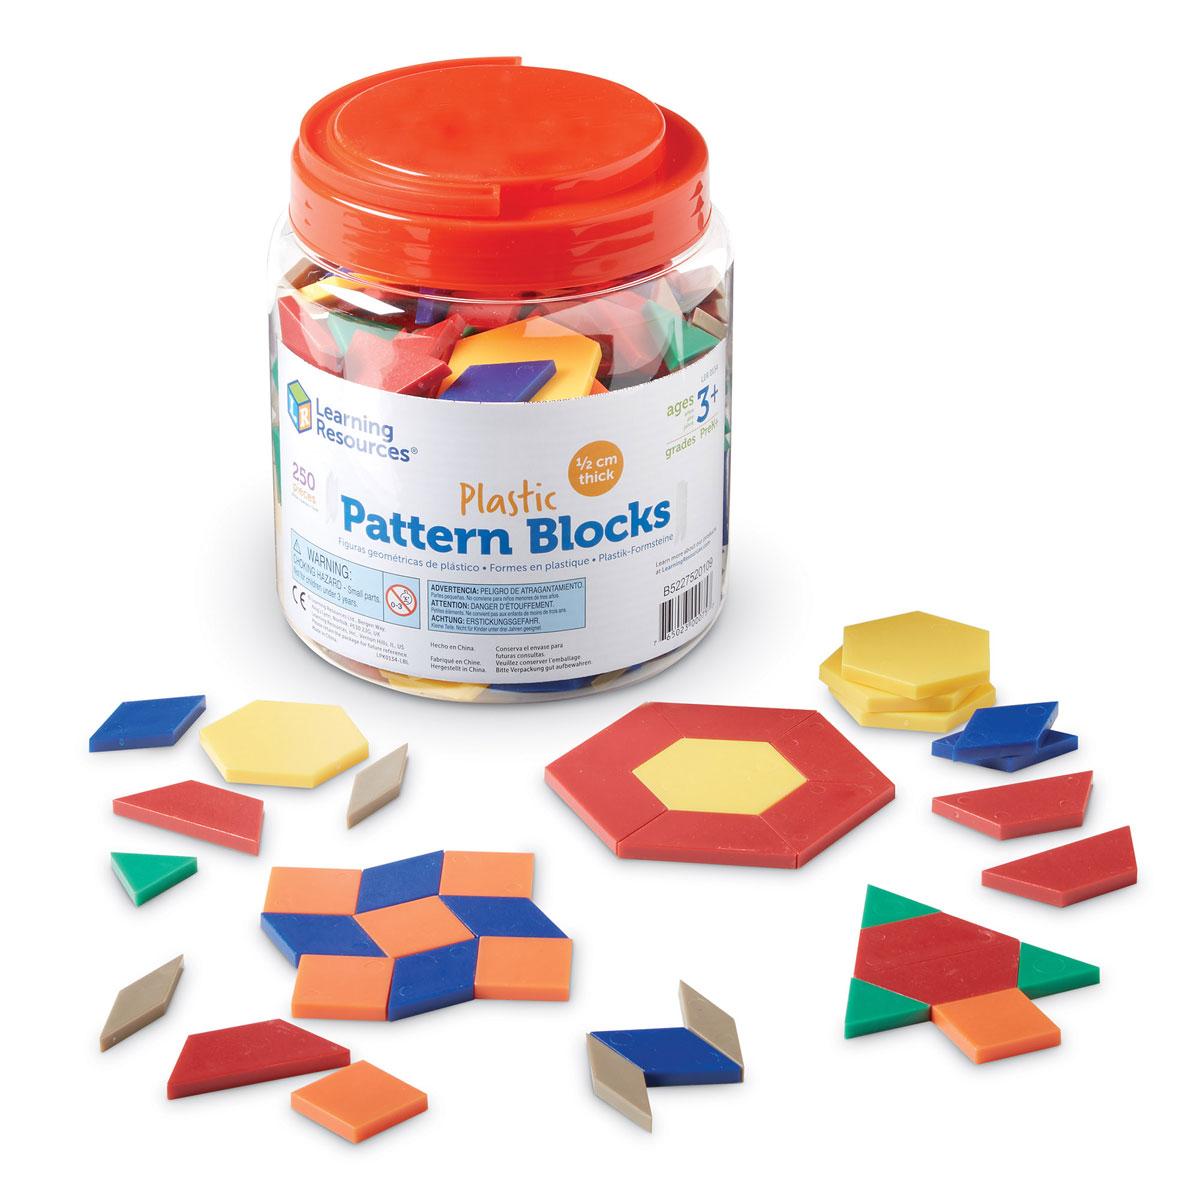 0 5cm Plastic Pattern Blocks